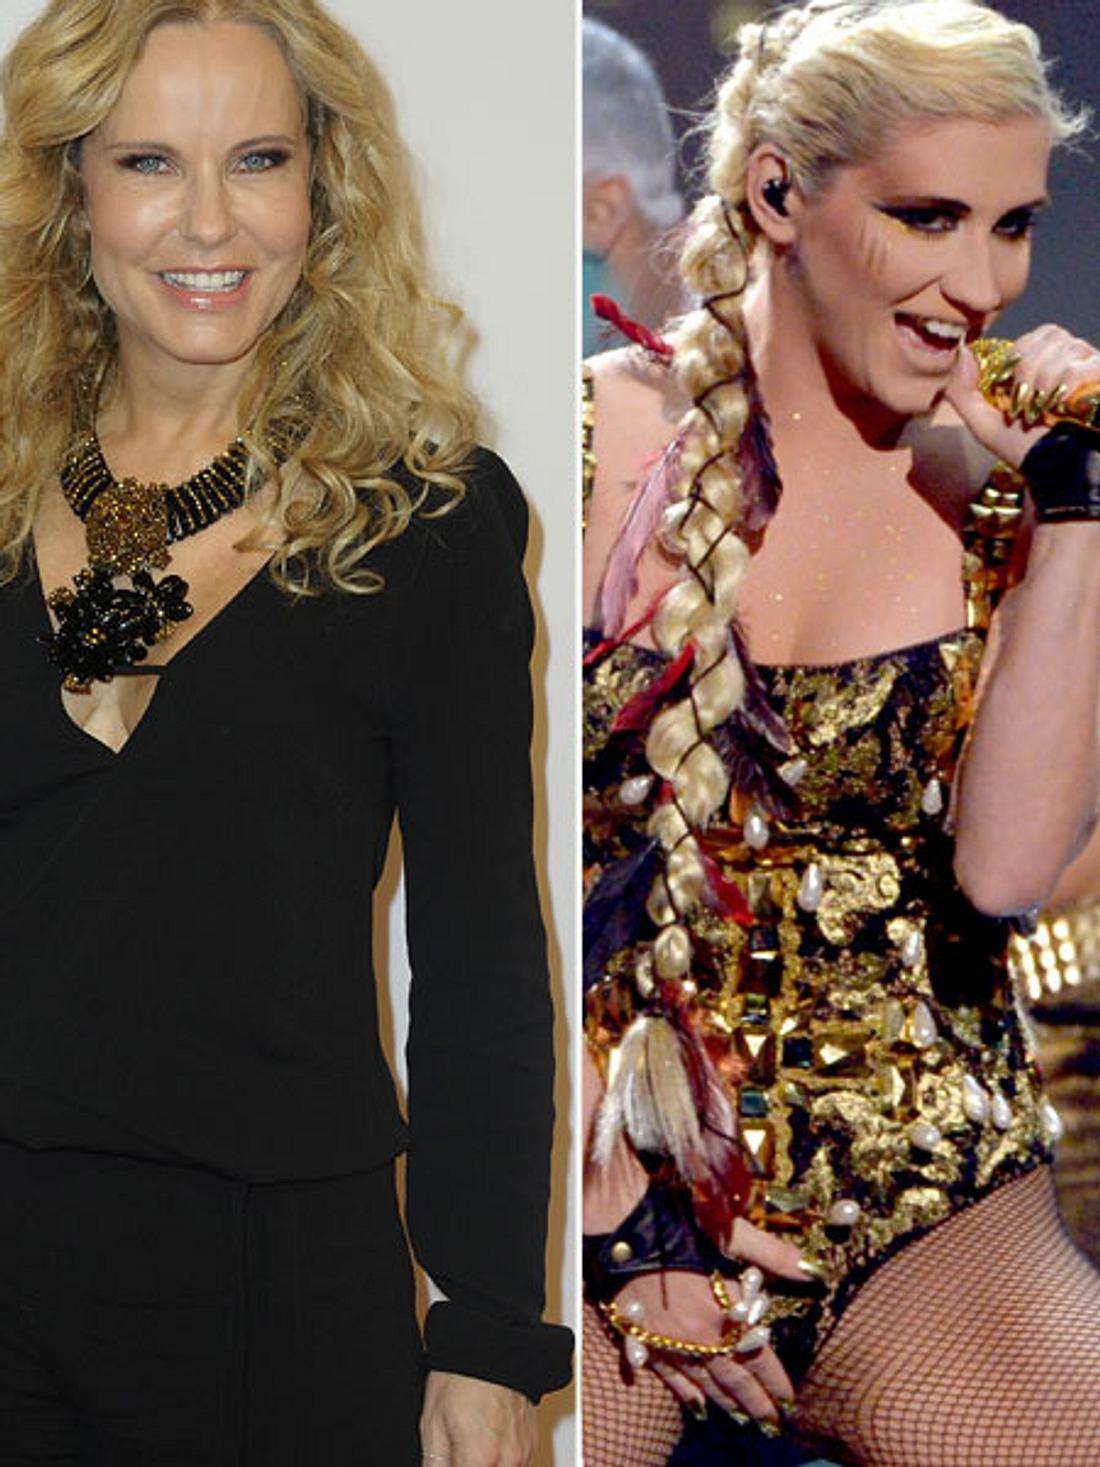 Katja Burkard betitelt Kesha als Schlampe